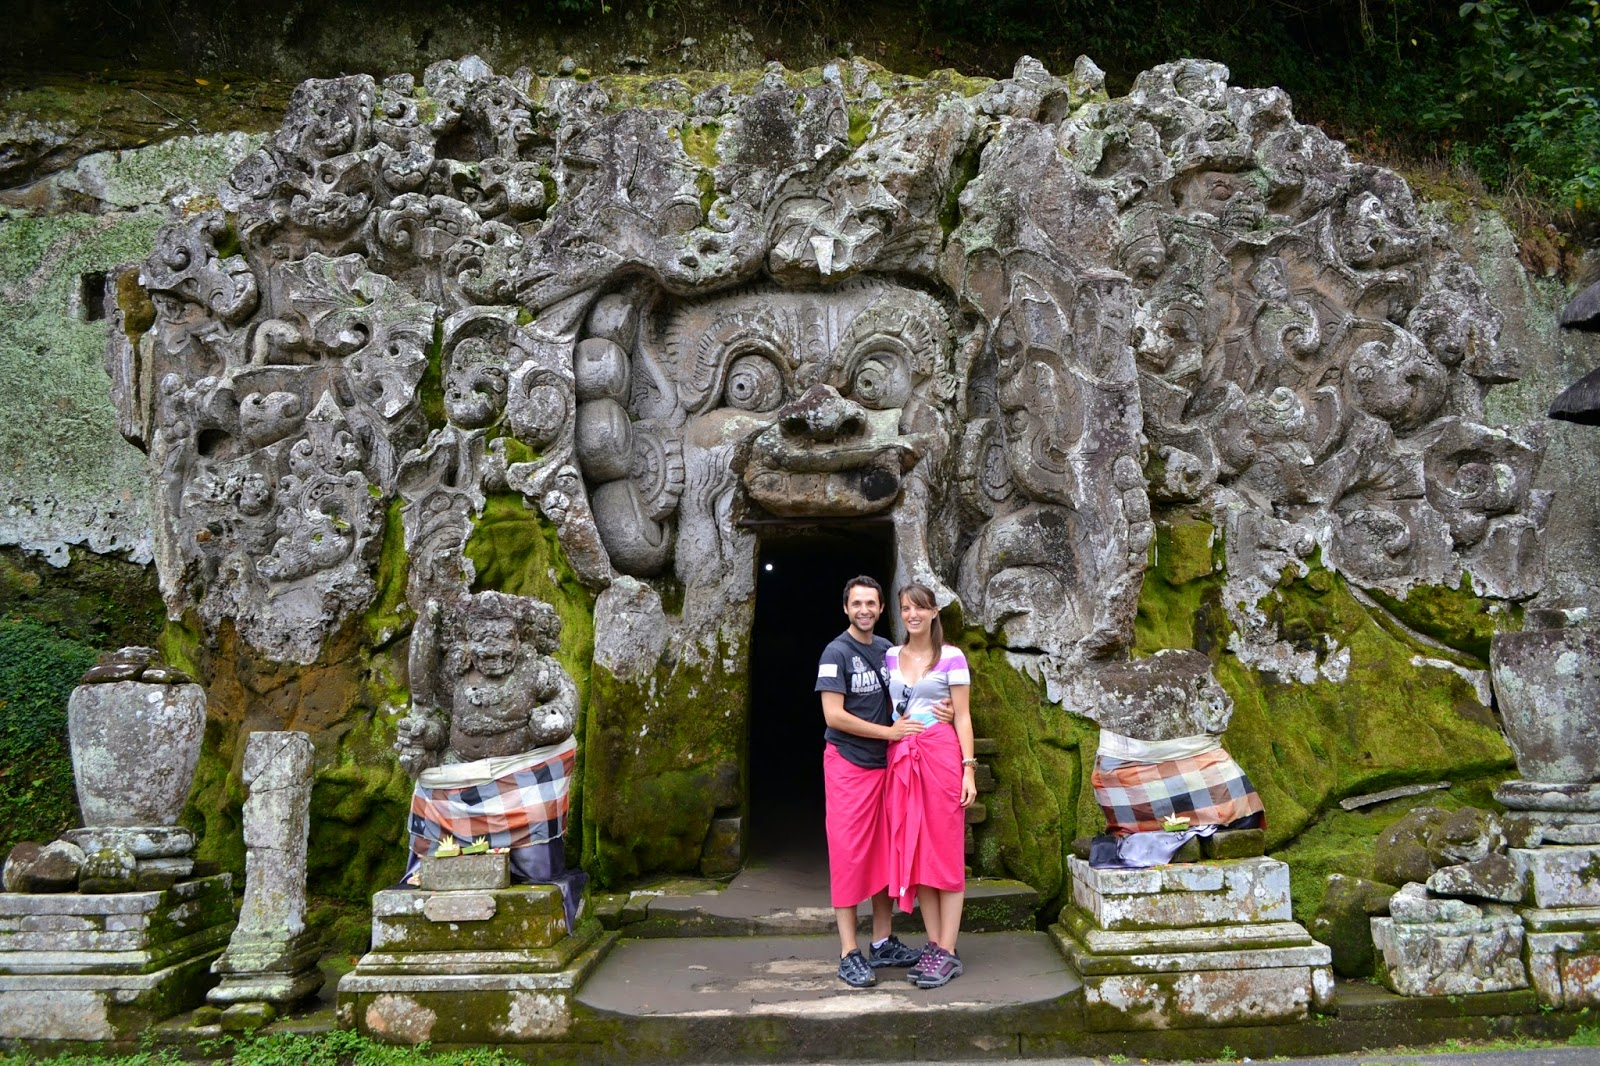 cueva del elefante, bali, indonesia